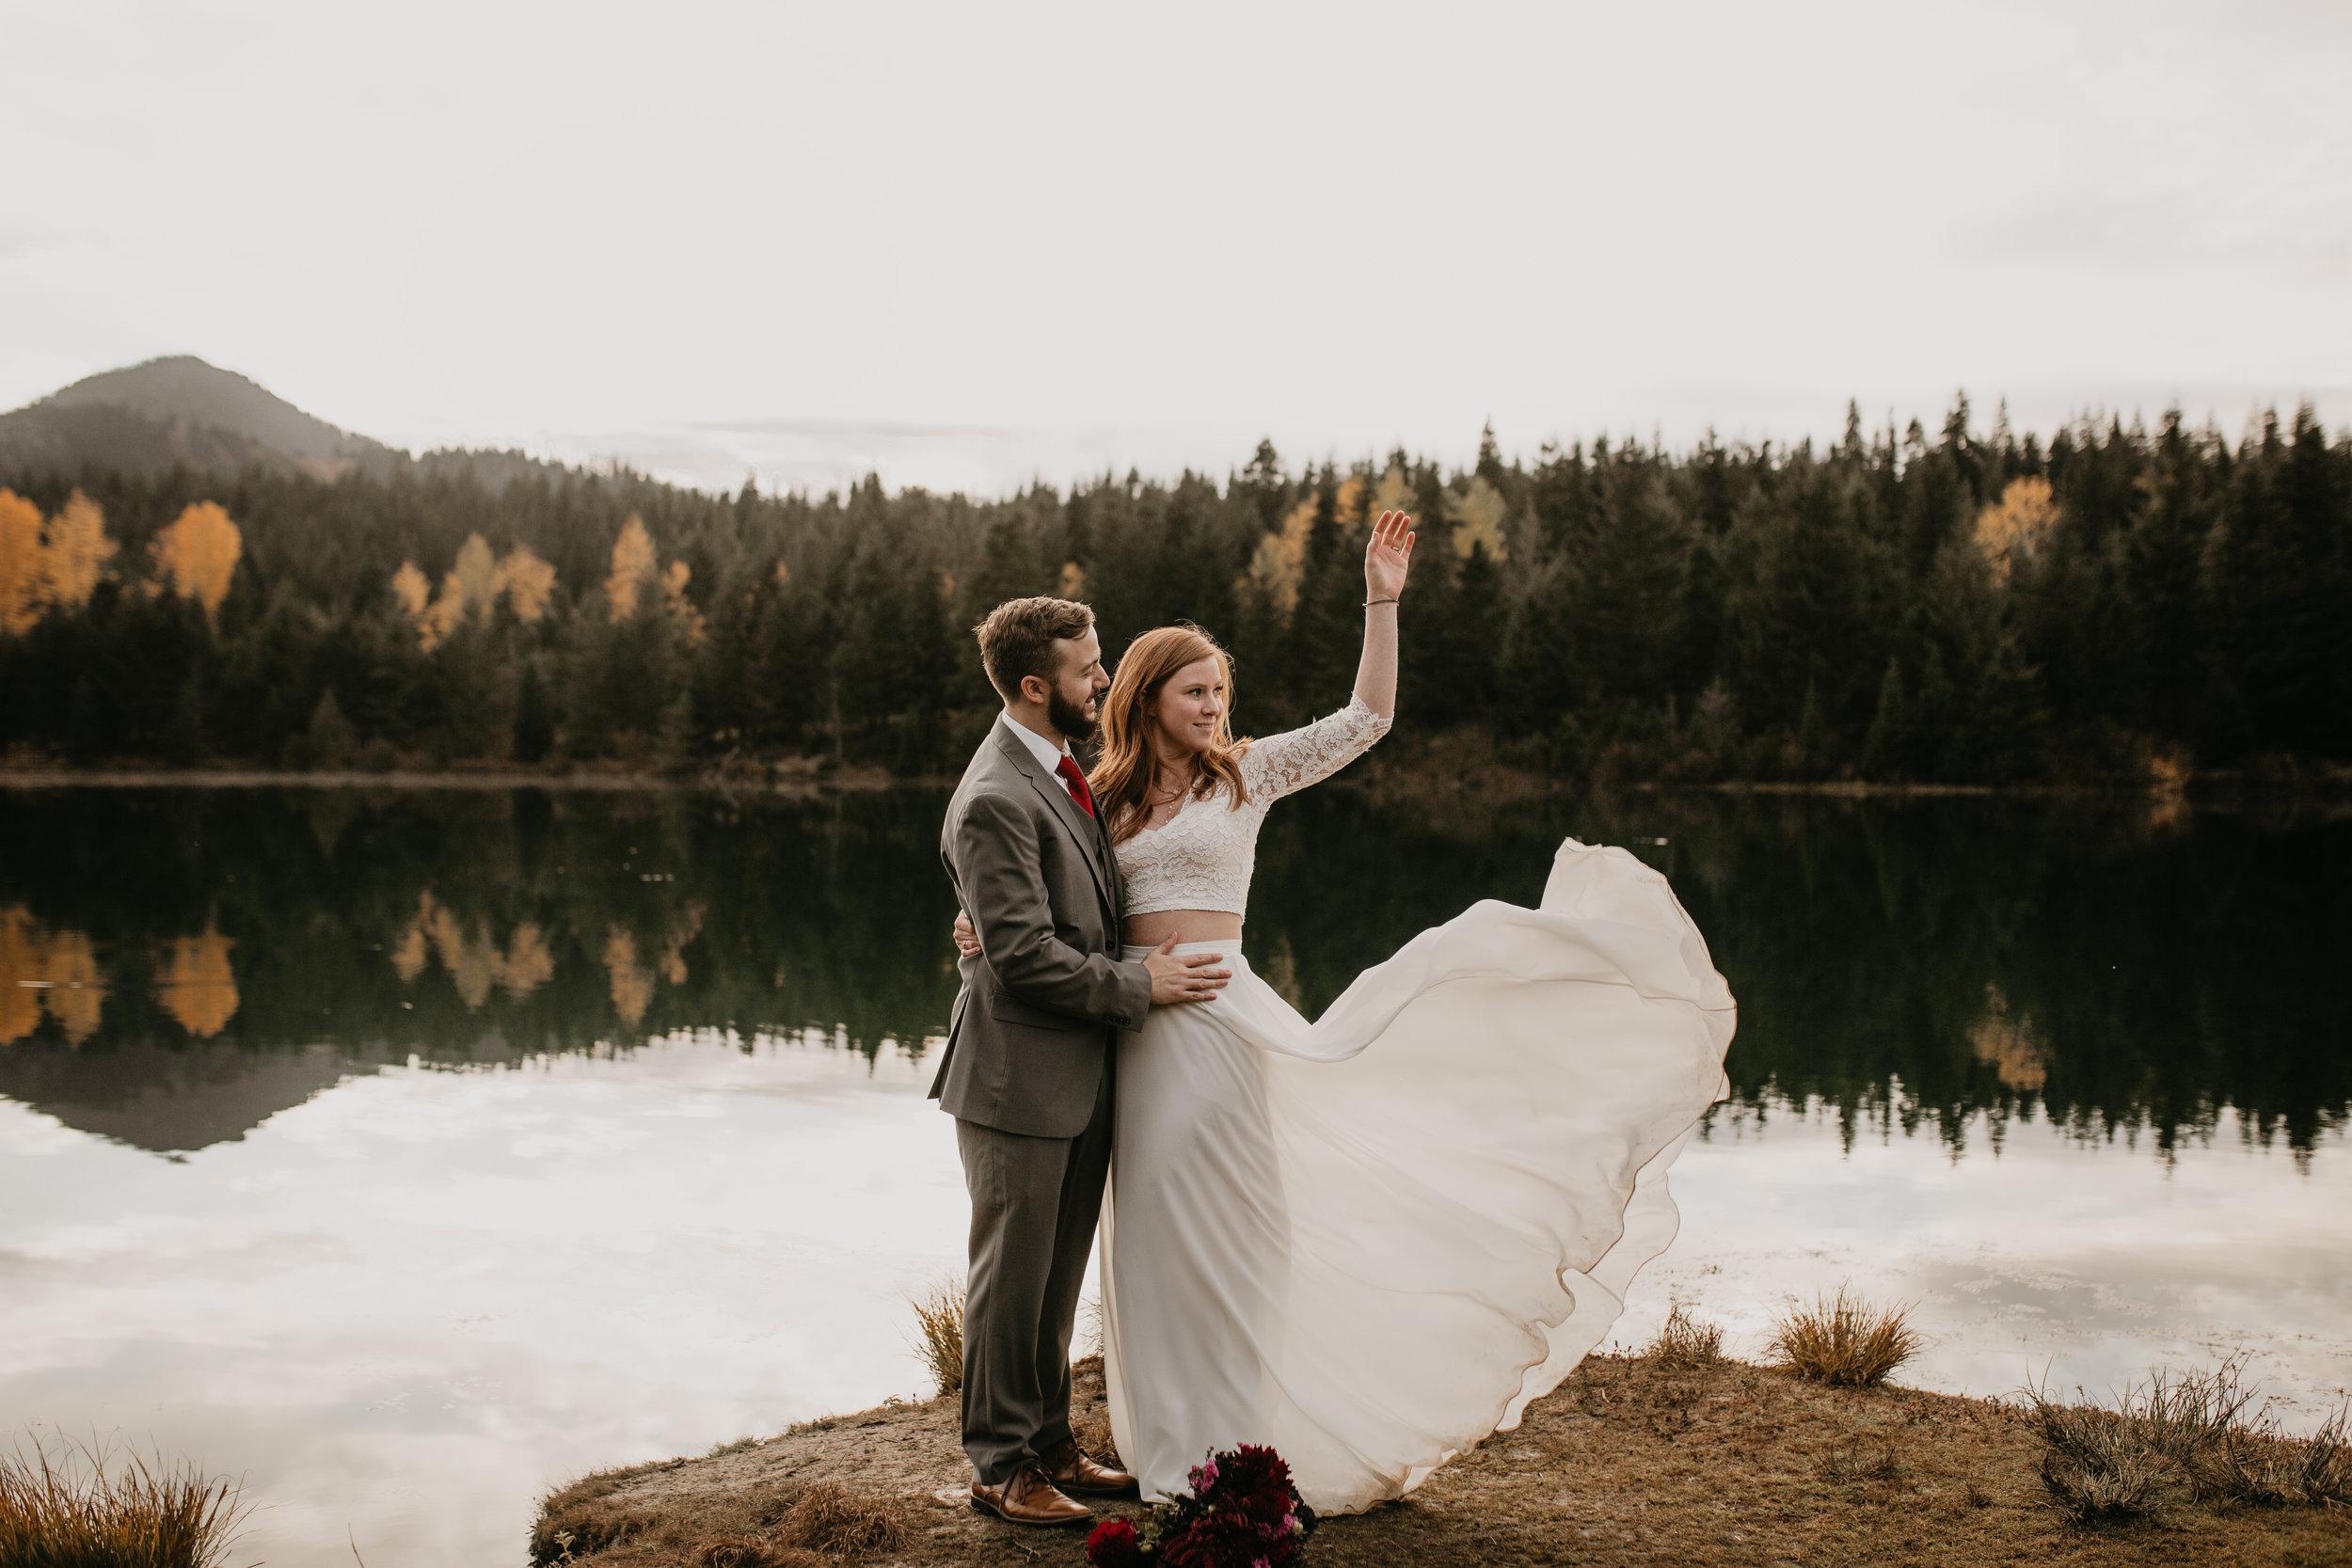 nicole-daacke-photography-mountain-view-elopement-at-gold-creek-pond-snoqualmie-washington-wa-elopement-photographer-photography-adventure-elopement-in-washington-fall-lakeside-golden-sunset-boho-fun-bride-0499.jpg